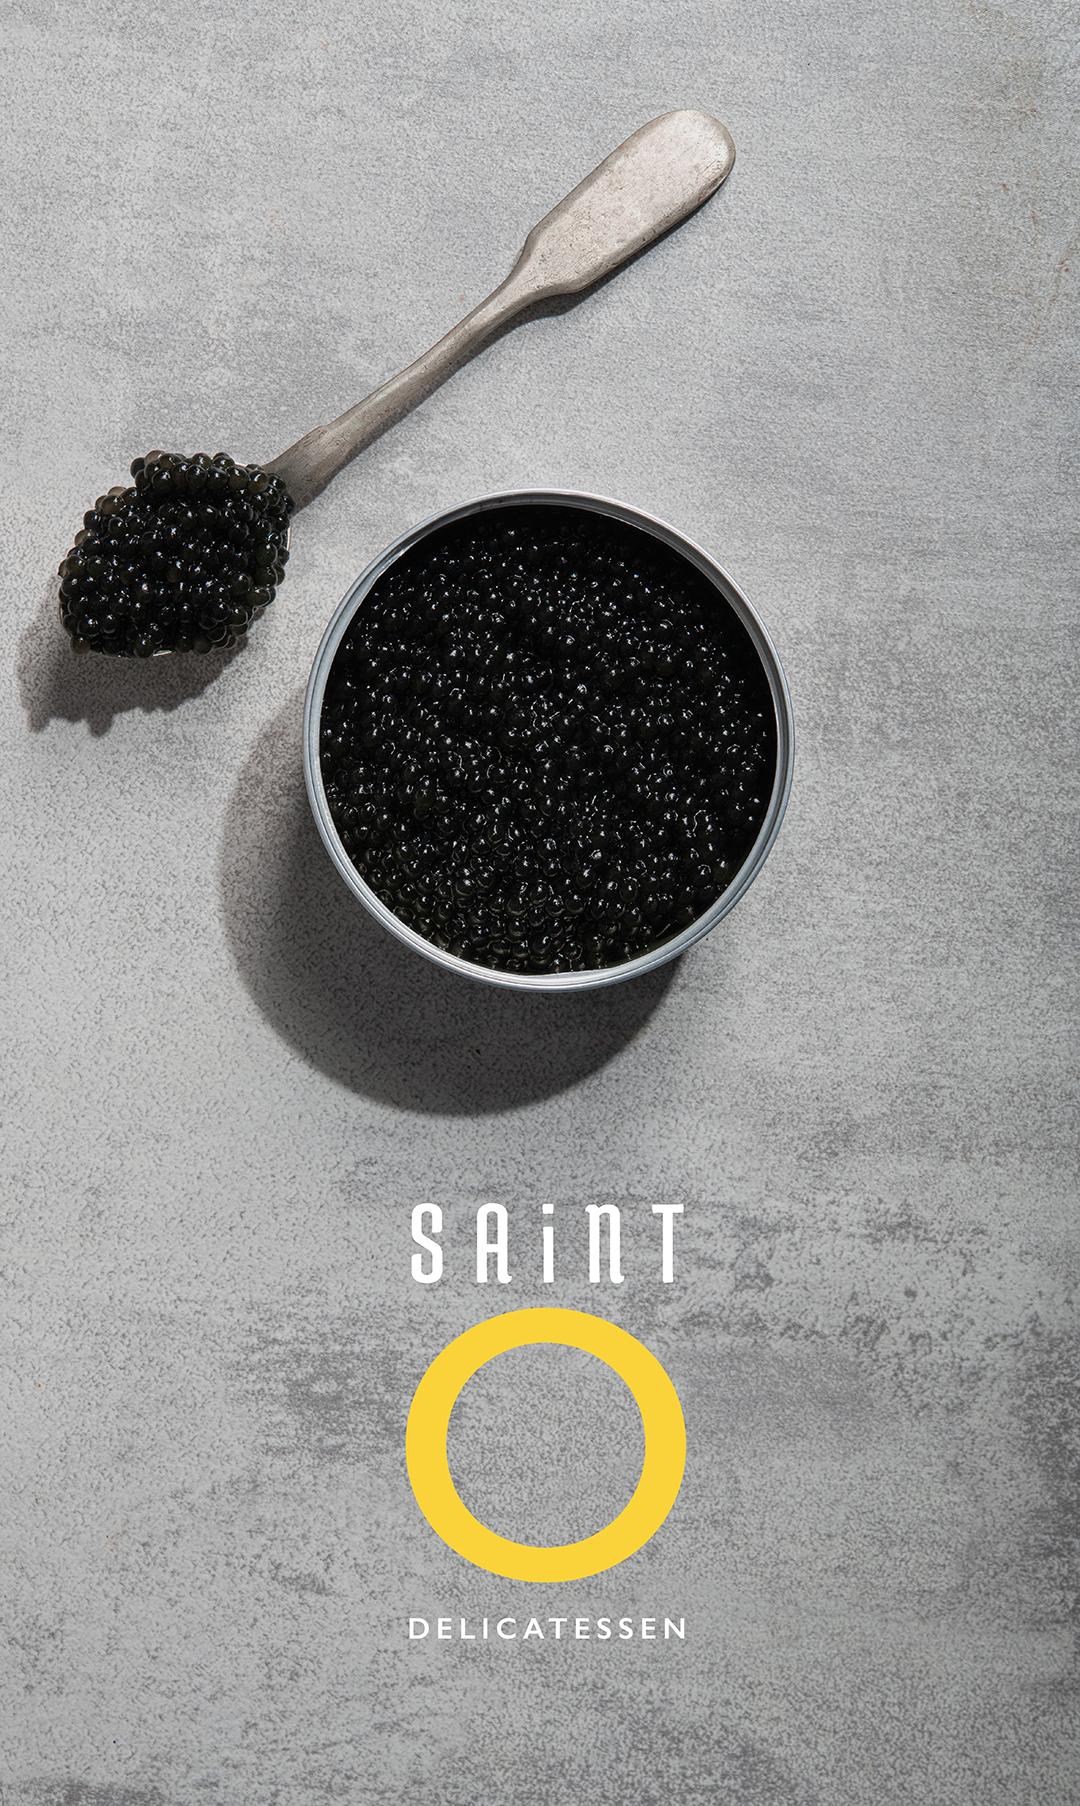 Saint O Delicatessen logo superimposed onto an image of black caviar